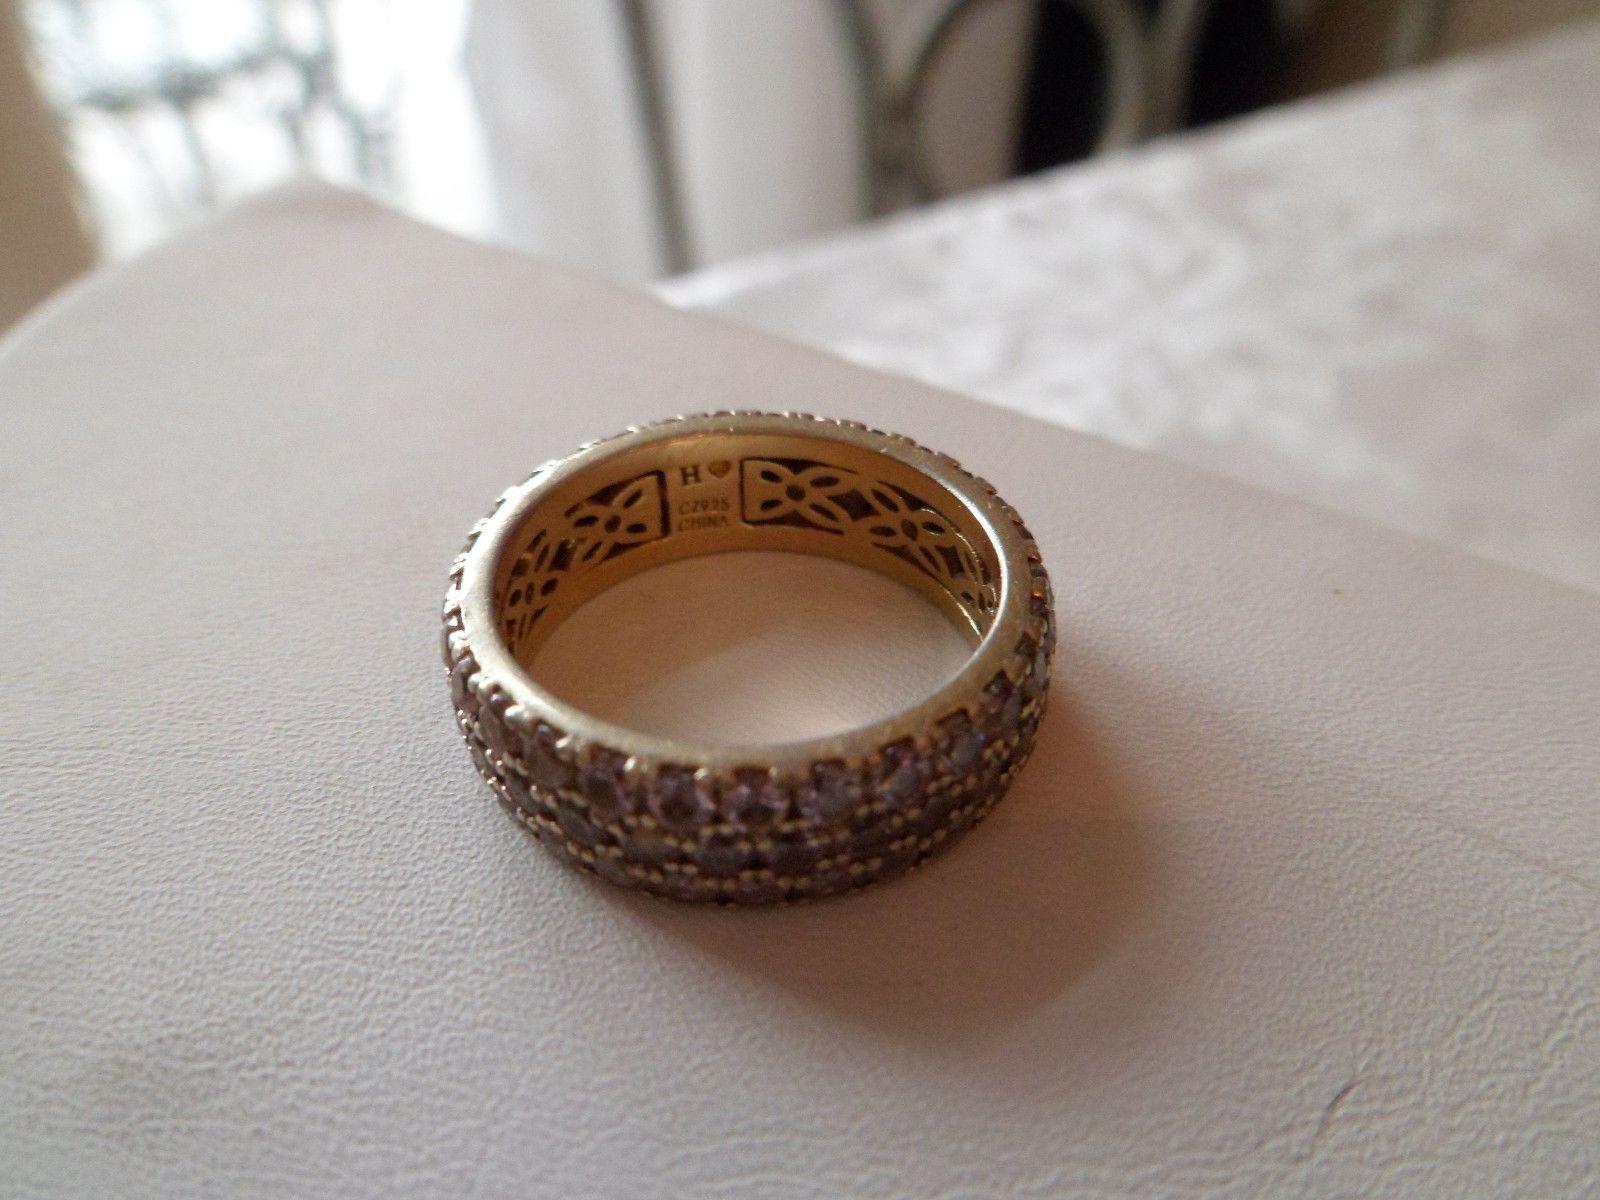 hsn wedding rings Hidalgo Diamonique Rose Gold Sterling Mega Pave Pink Eternity Ring QVC eBay